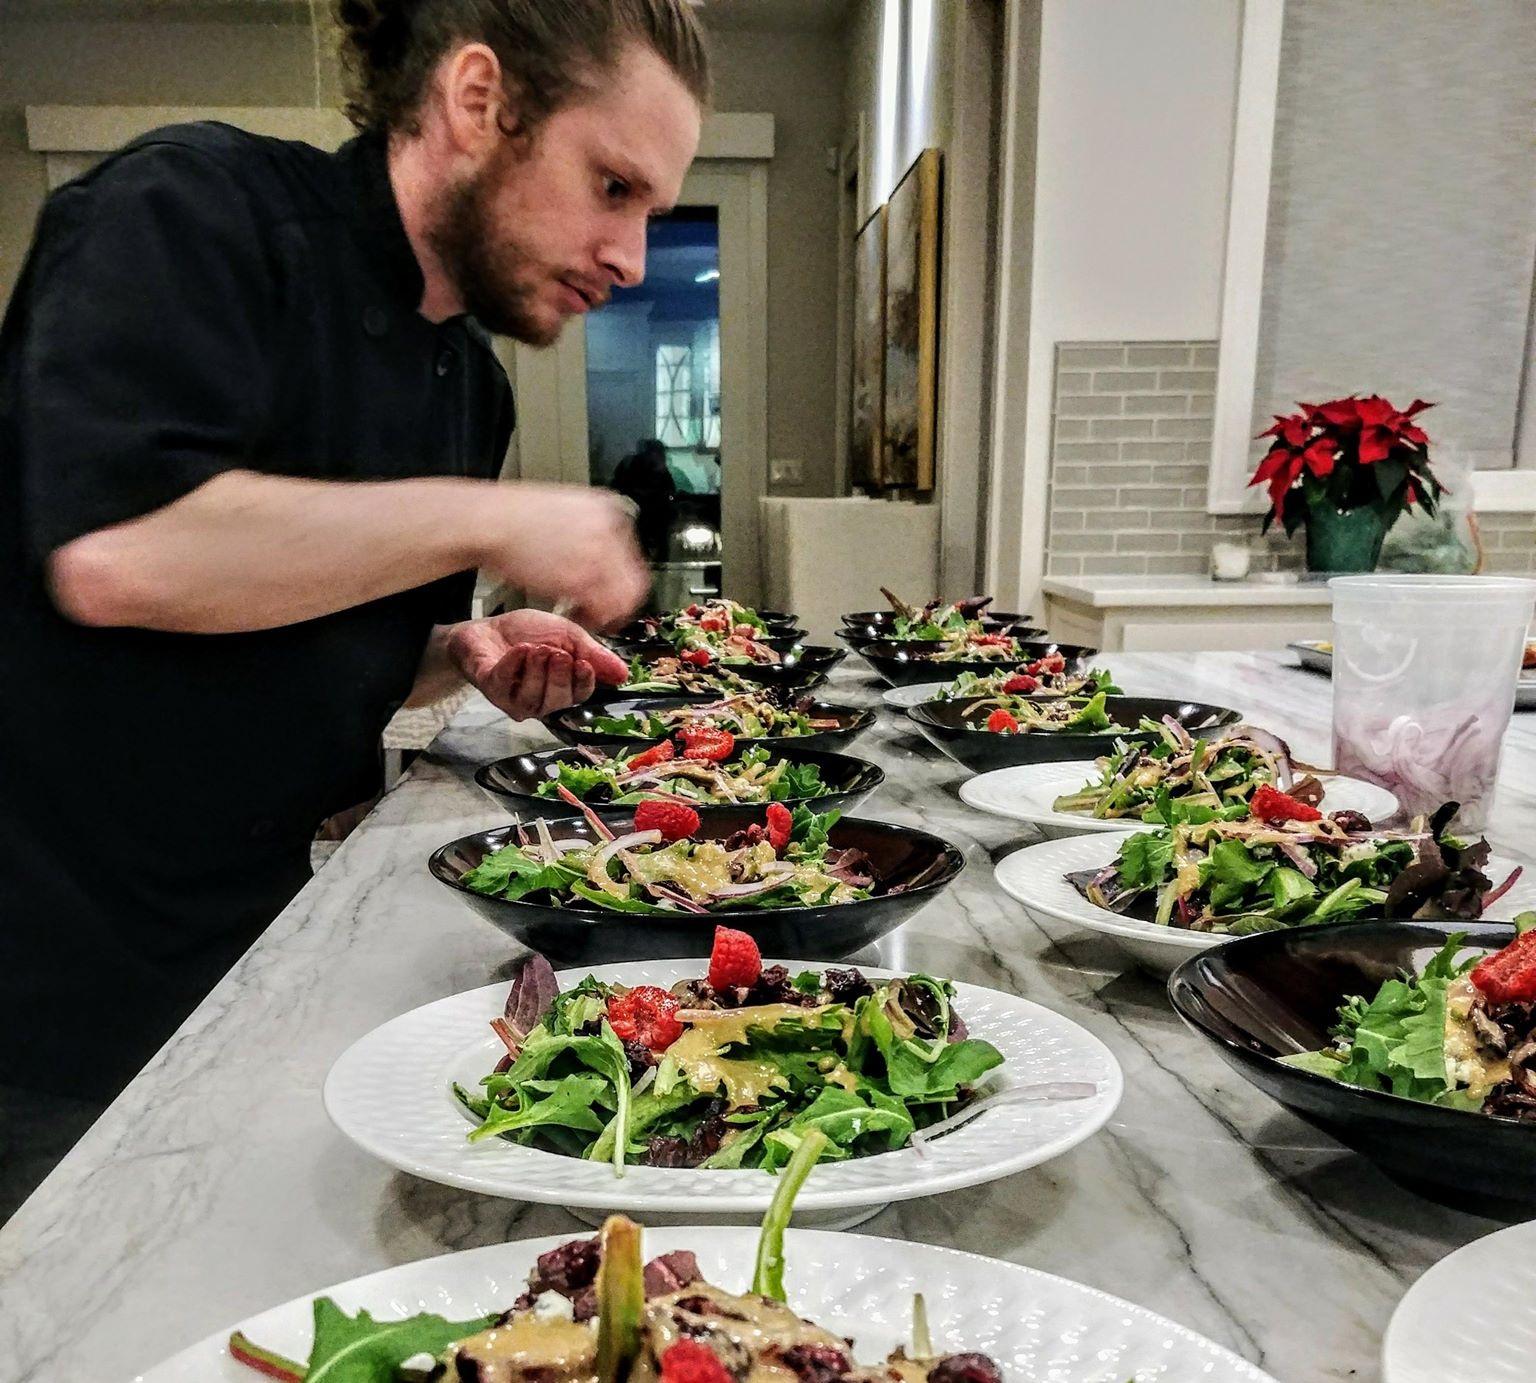 catering-kansascity-chef